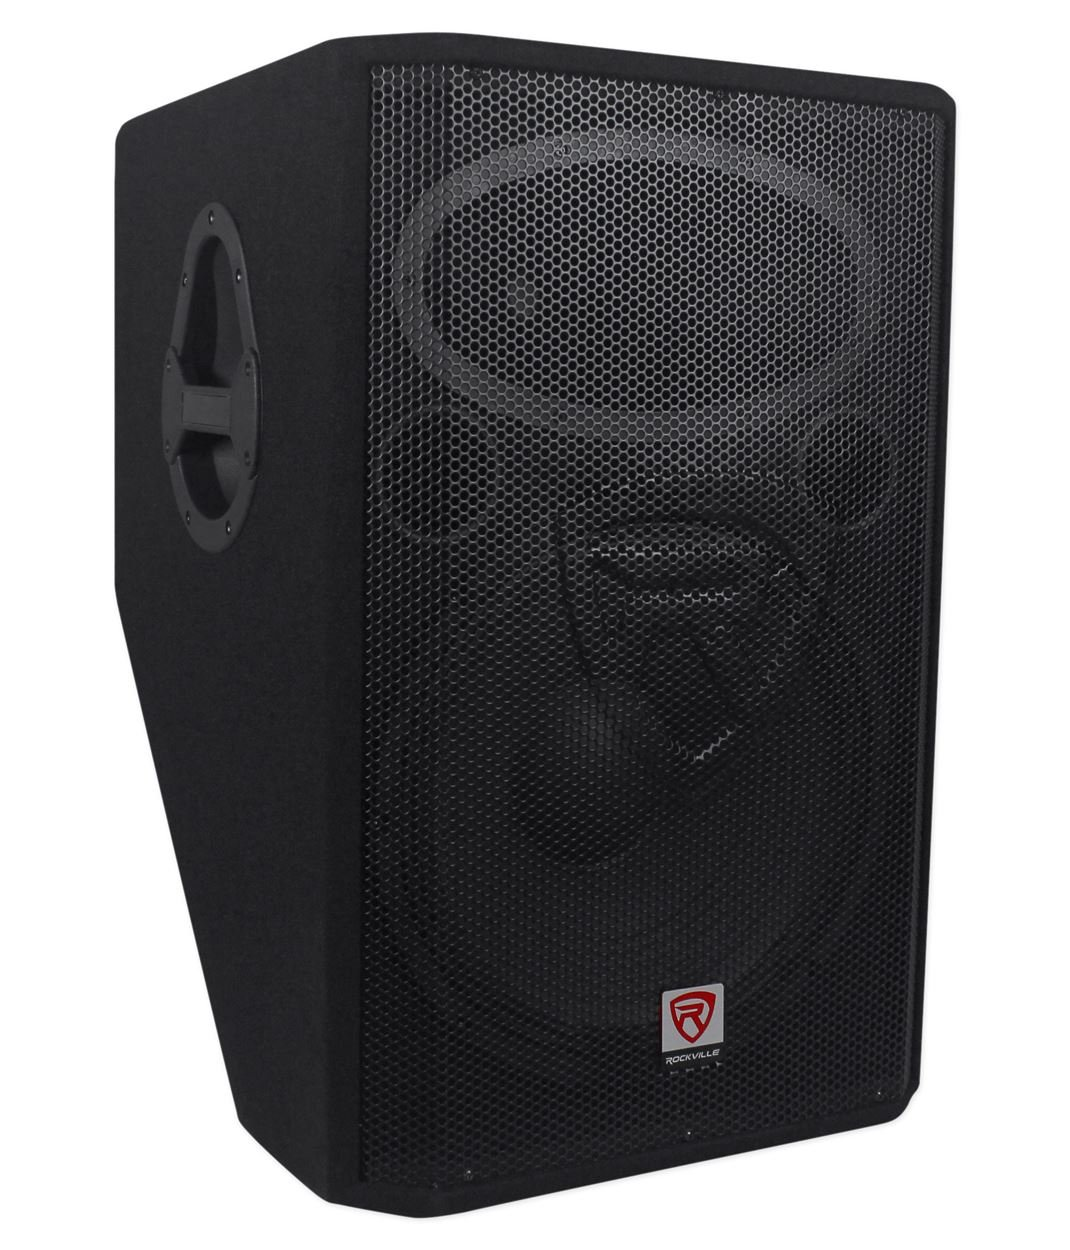 Rockville 15'' 1400 Watt 2-Way Passive Stage Floor Monitor Speaker, black (RSM15P) by Rockville